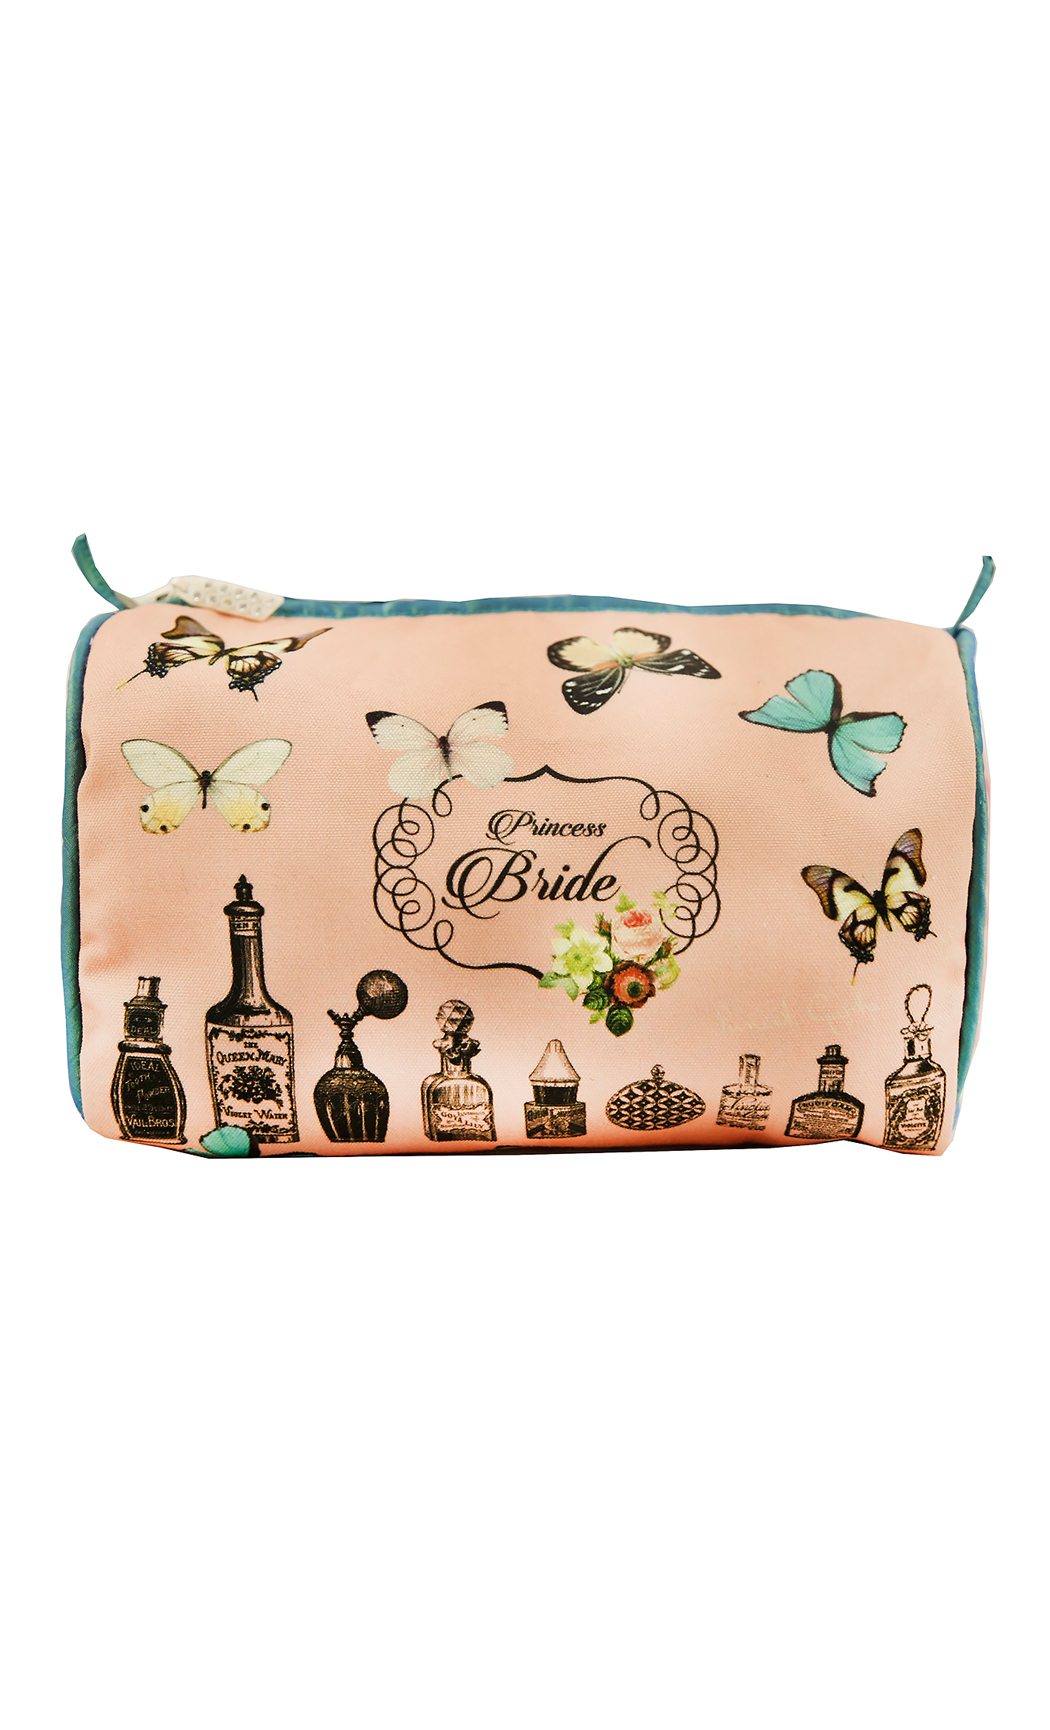 Princess Bride Vanity Bag